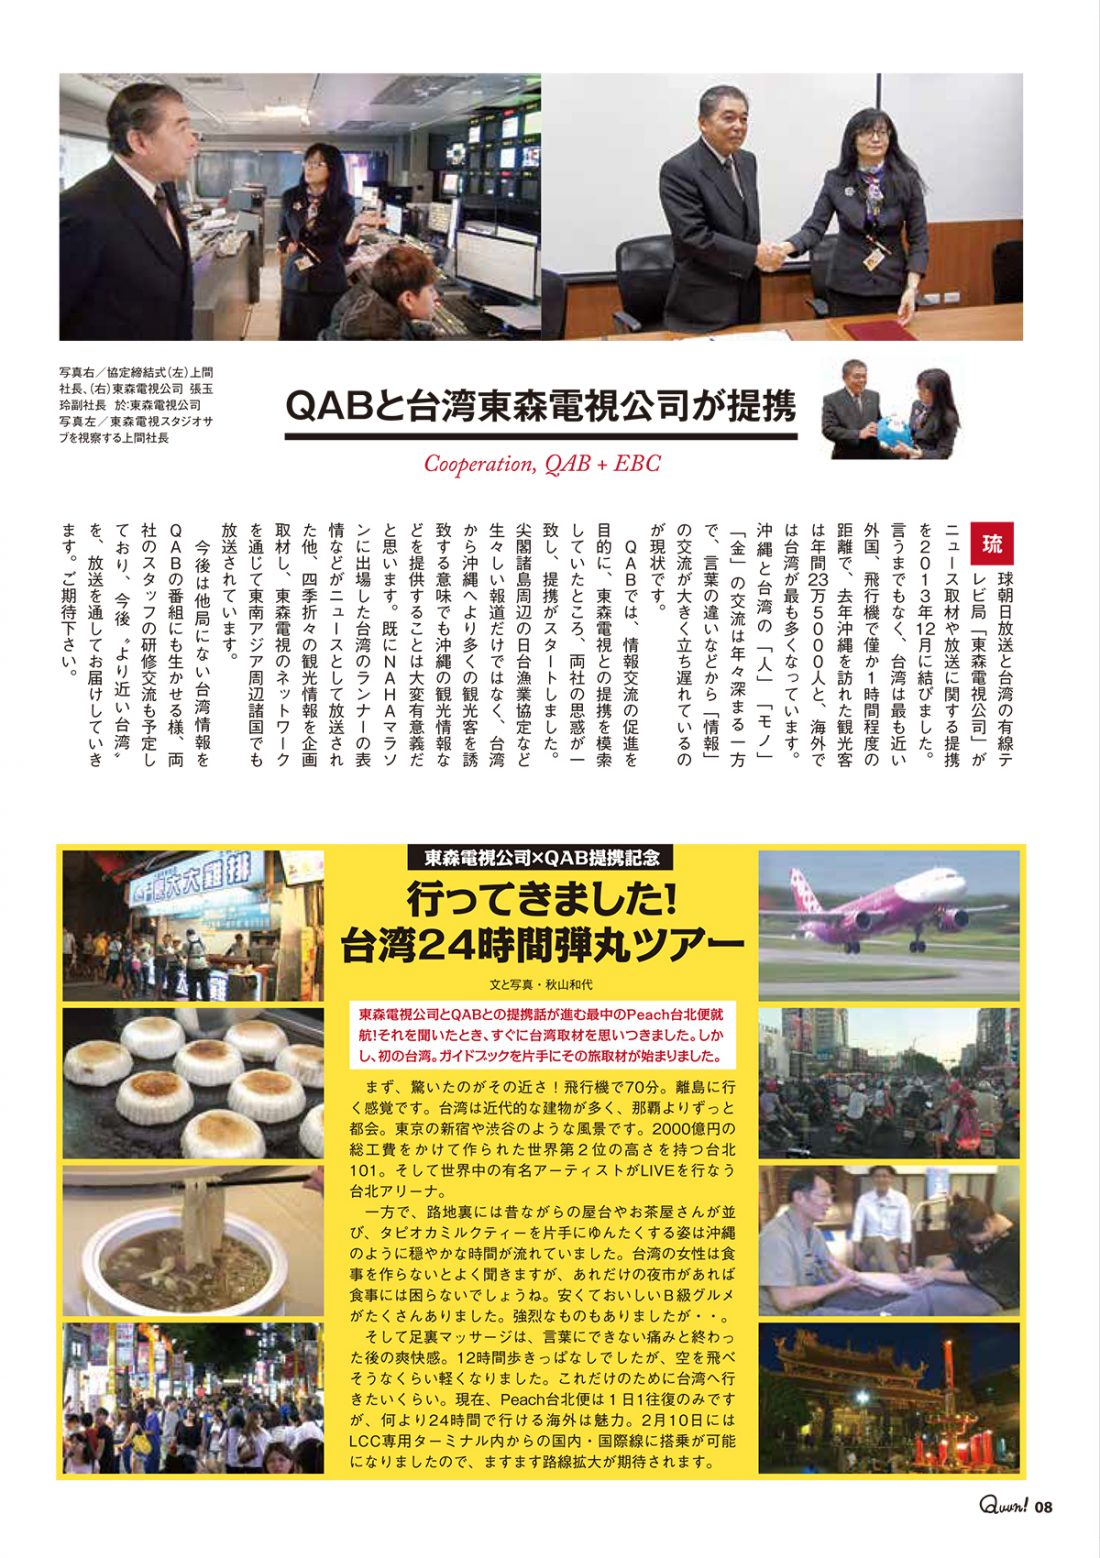 http://www.qab.co.jp/qgoro/wp-content/uploads/quun_0110-1100x1558.jpg